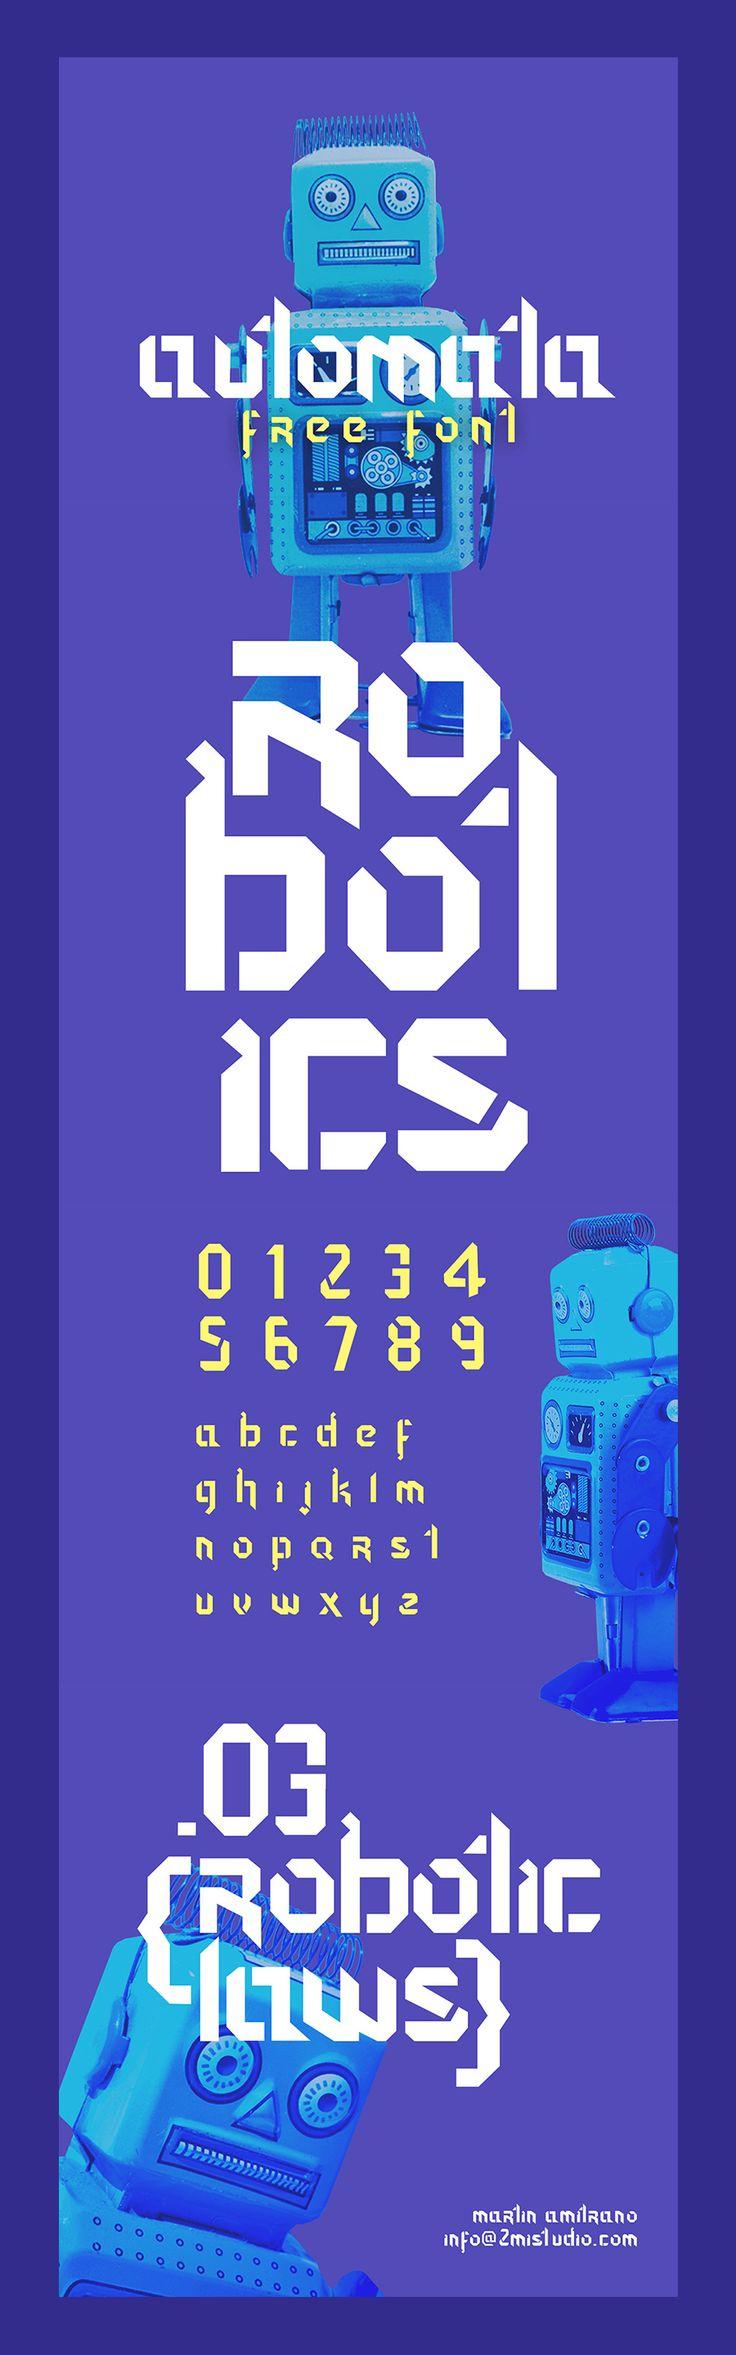 Automata Display Free Typeface - Free Design Resources